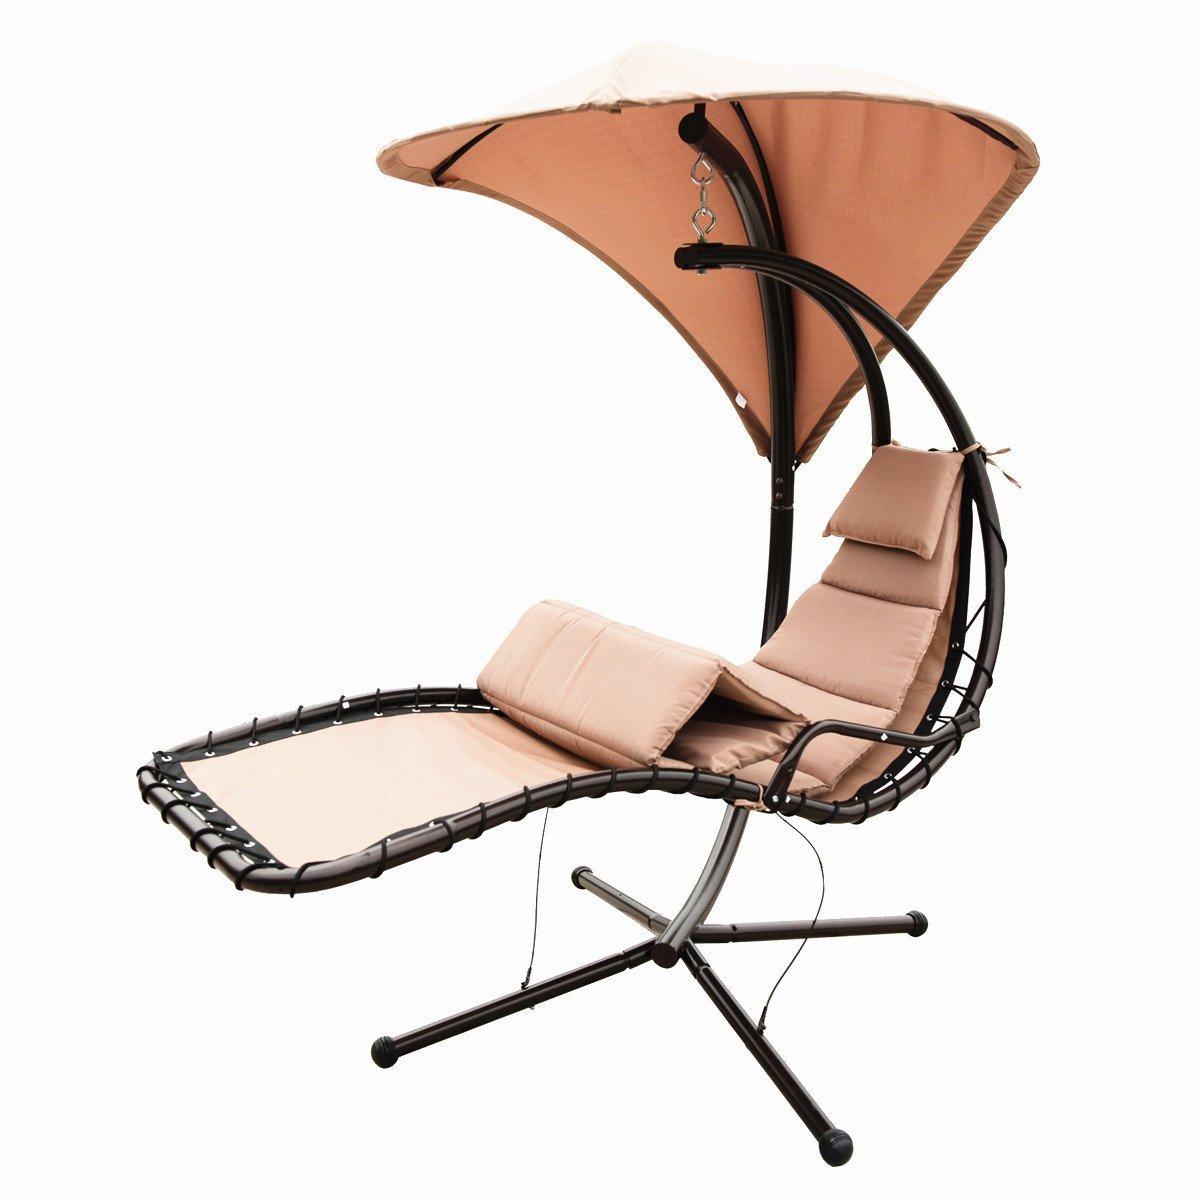 Amazon.com : Naturefun Hammock Chair with Arc Stand / Adjustable ...